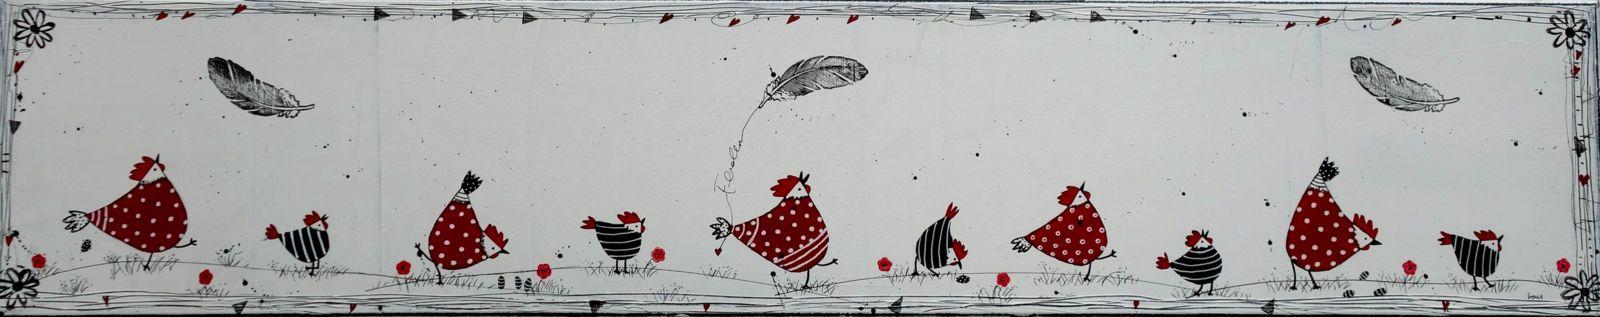 Hühnerparade